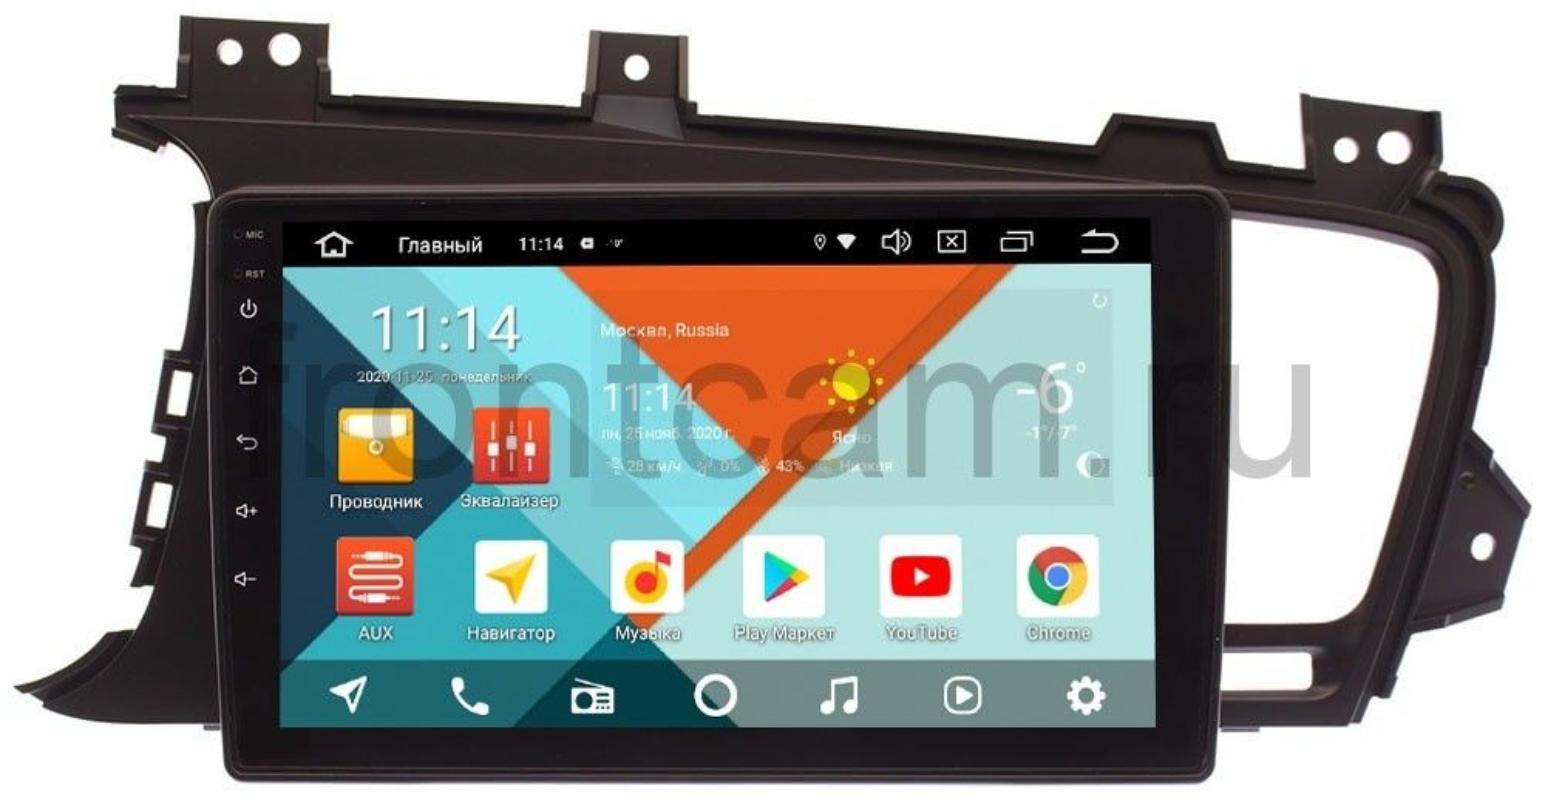 Штатная магнитола Wide Media KS9016QM-2/32 DSP CarPlay 4G-SIM для Kia Optima III 2010-2013 на Android 10 для авто с камерой (+ Камера заднего вида в подарок!)